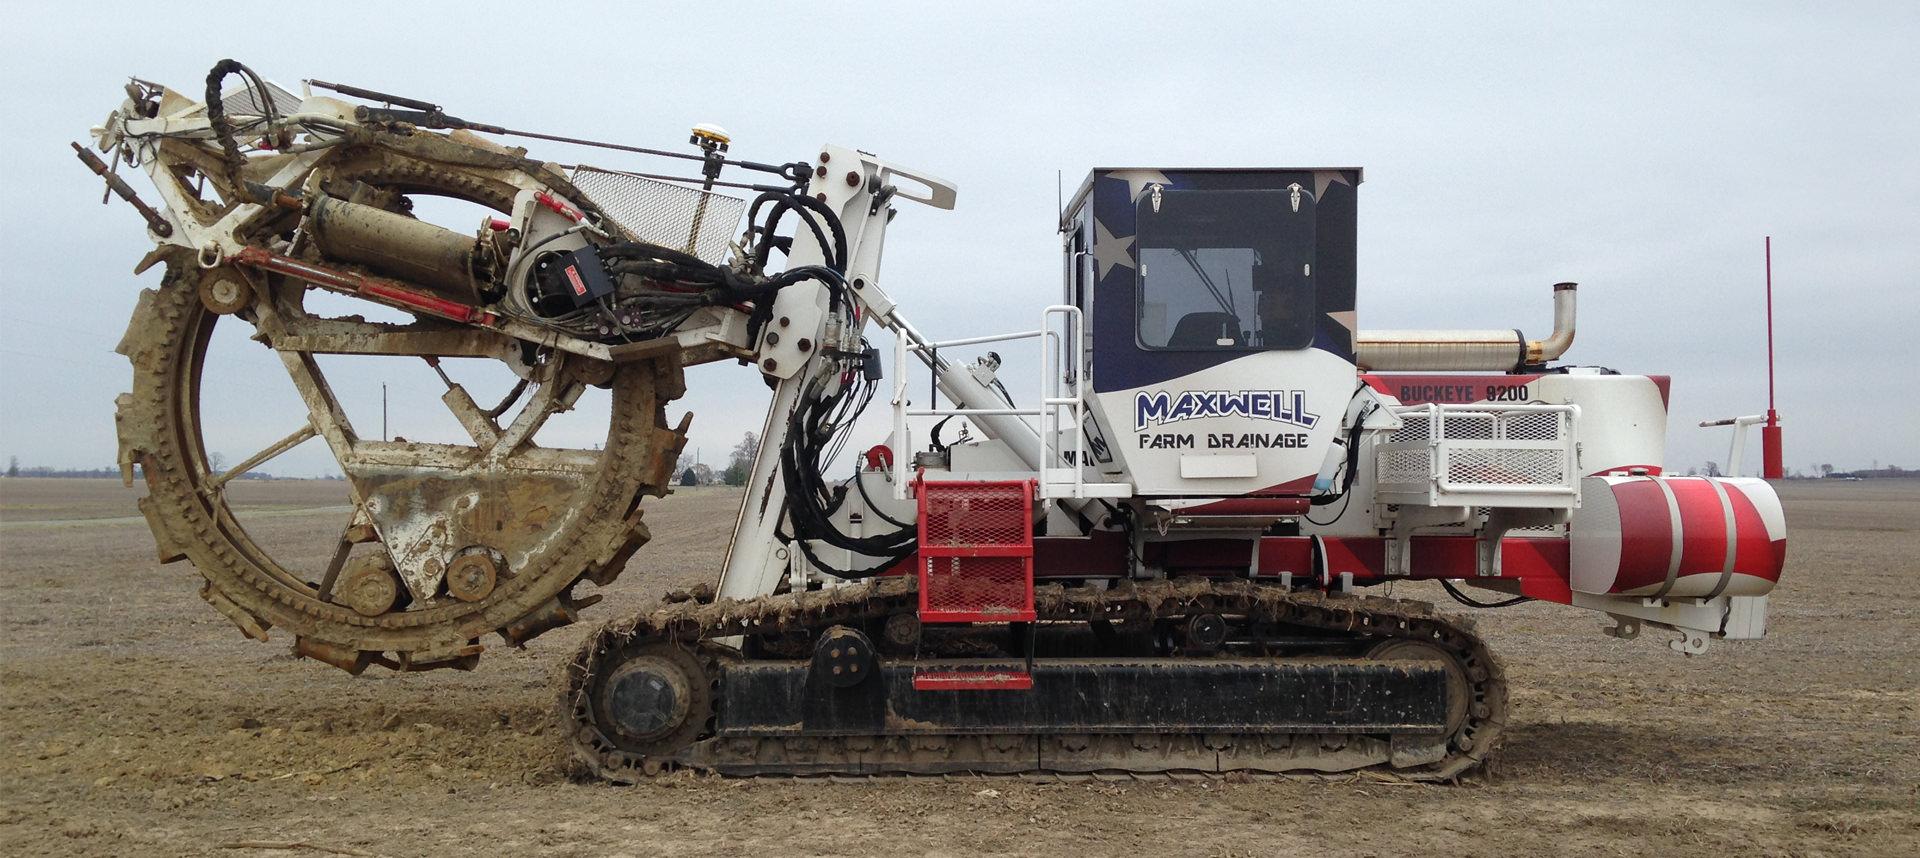 maxwell farm drainage